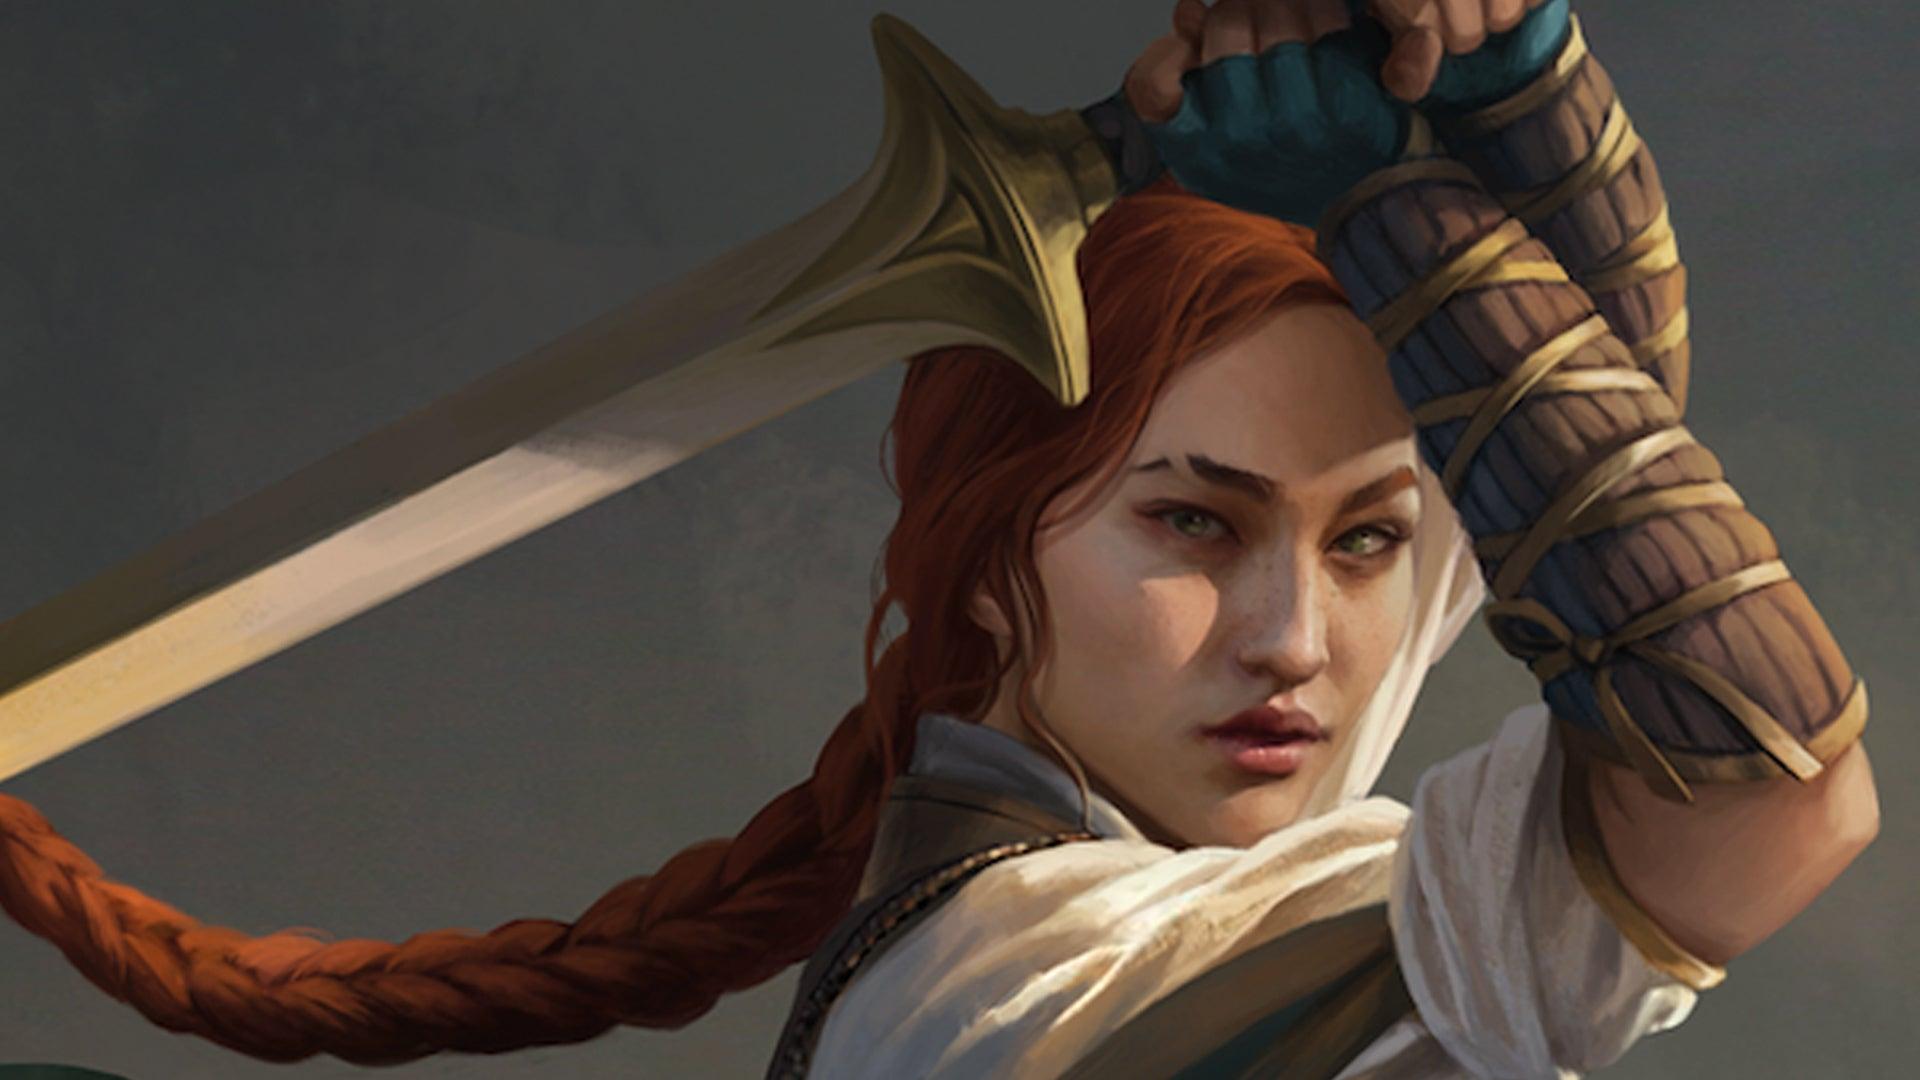 Image for Splendor designer's ambitious co-op adventure Soul Raiders lacks story and sparkle - Kickstarter preview